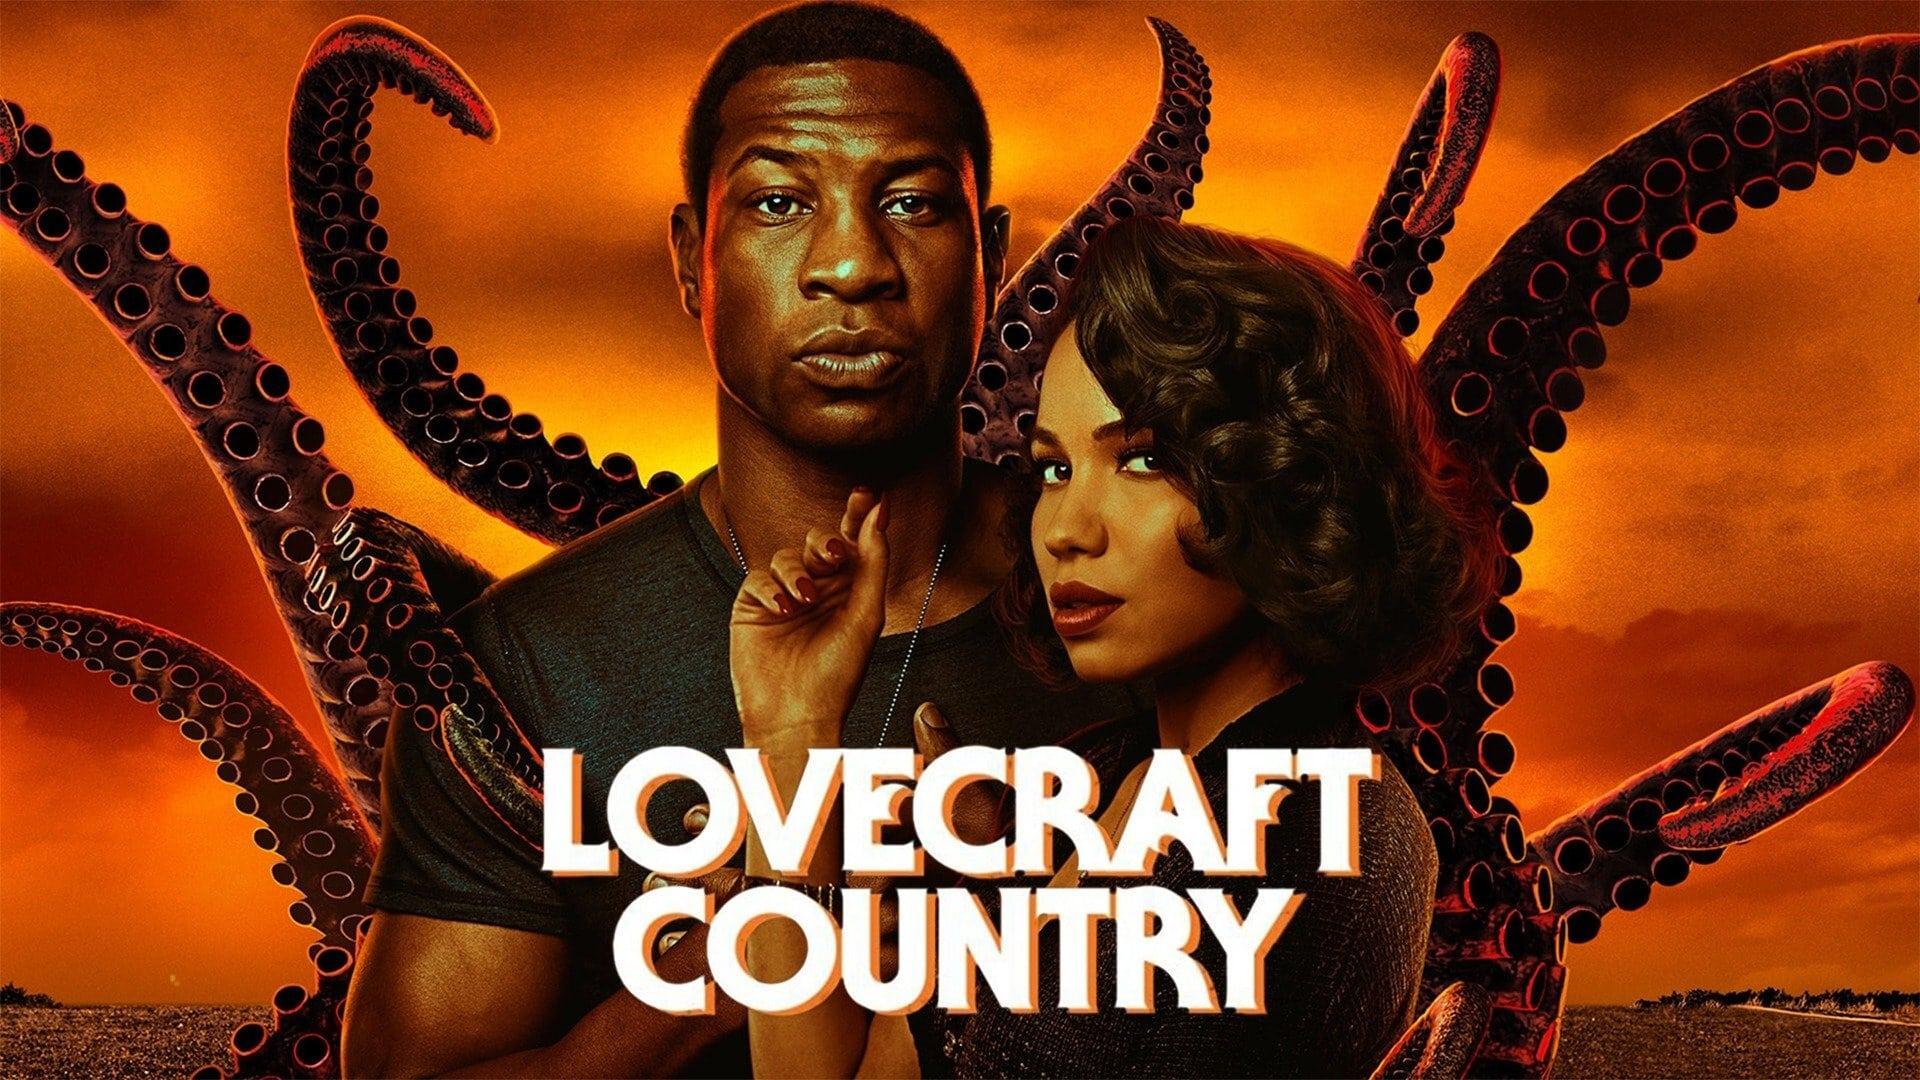 Lovecraft Country Season 1 Episode 9